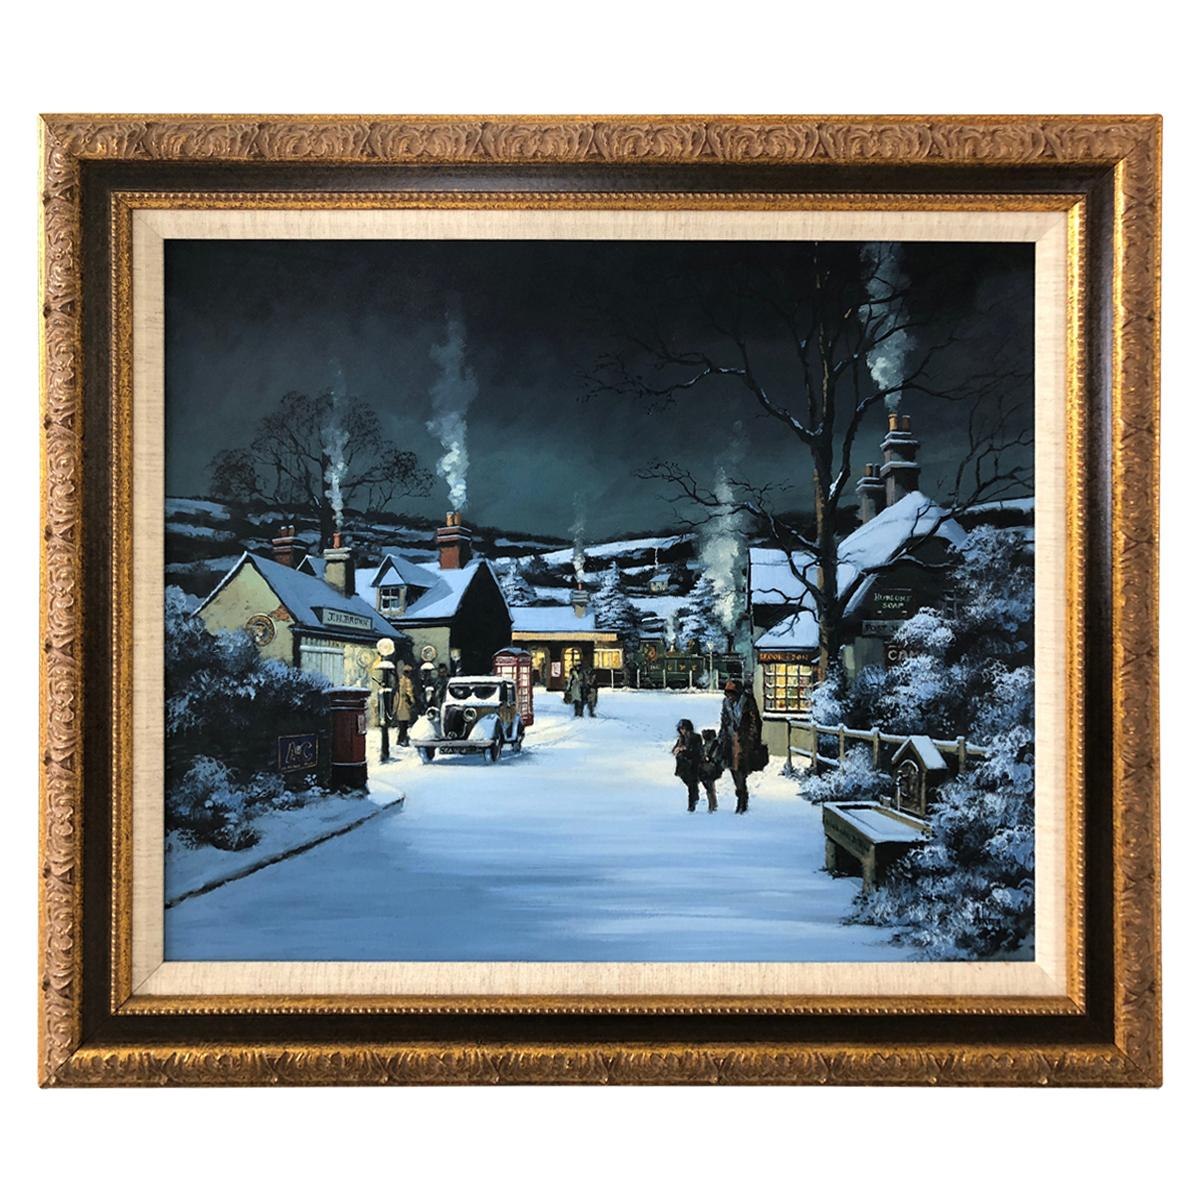 Charming Winter Night Scene Oil Painting